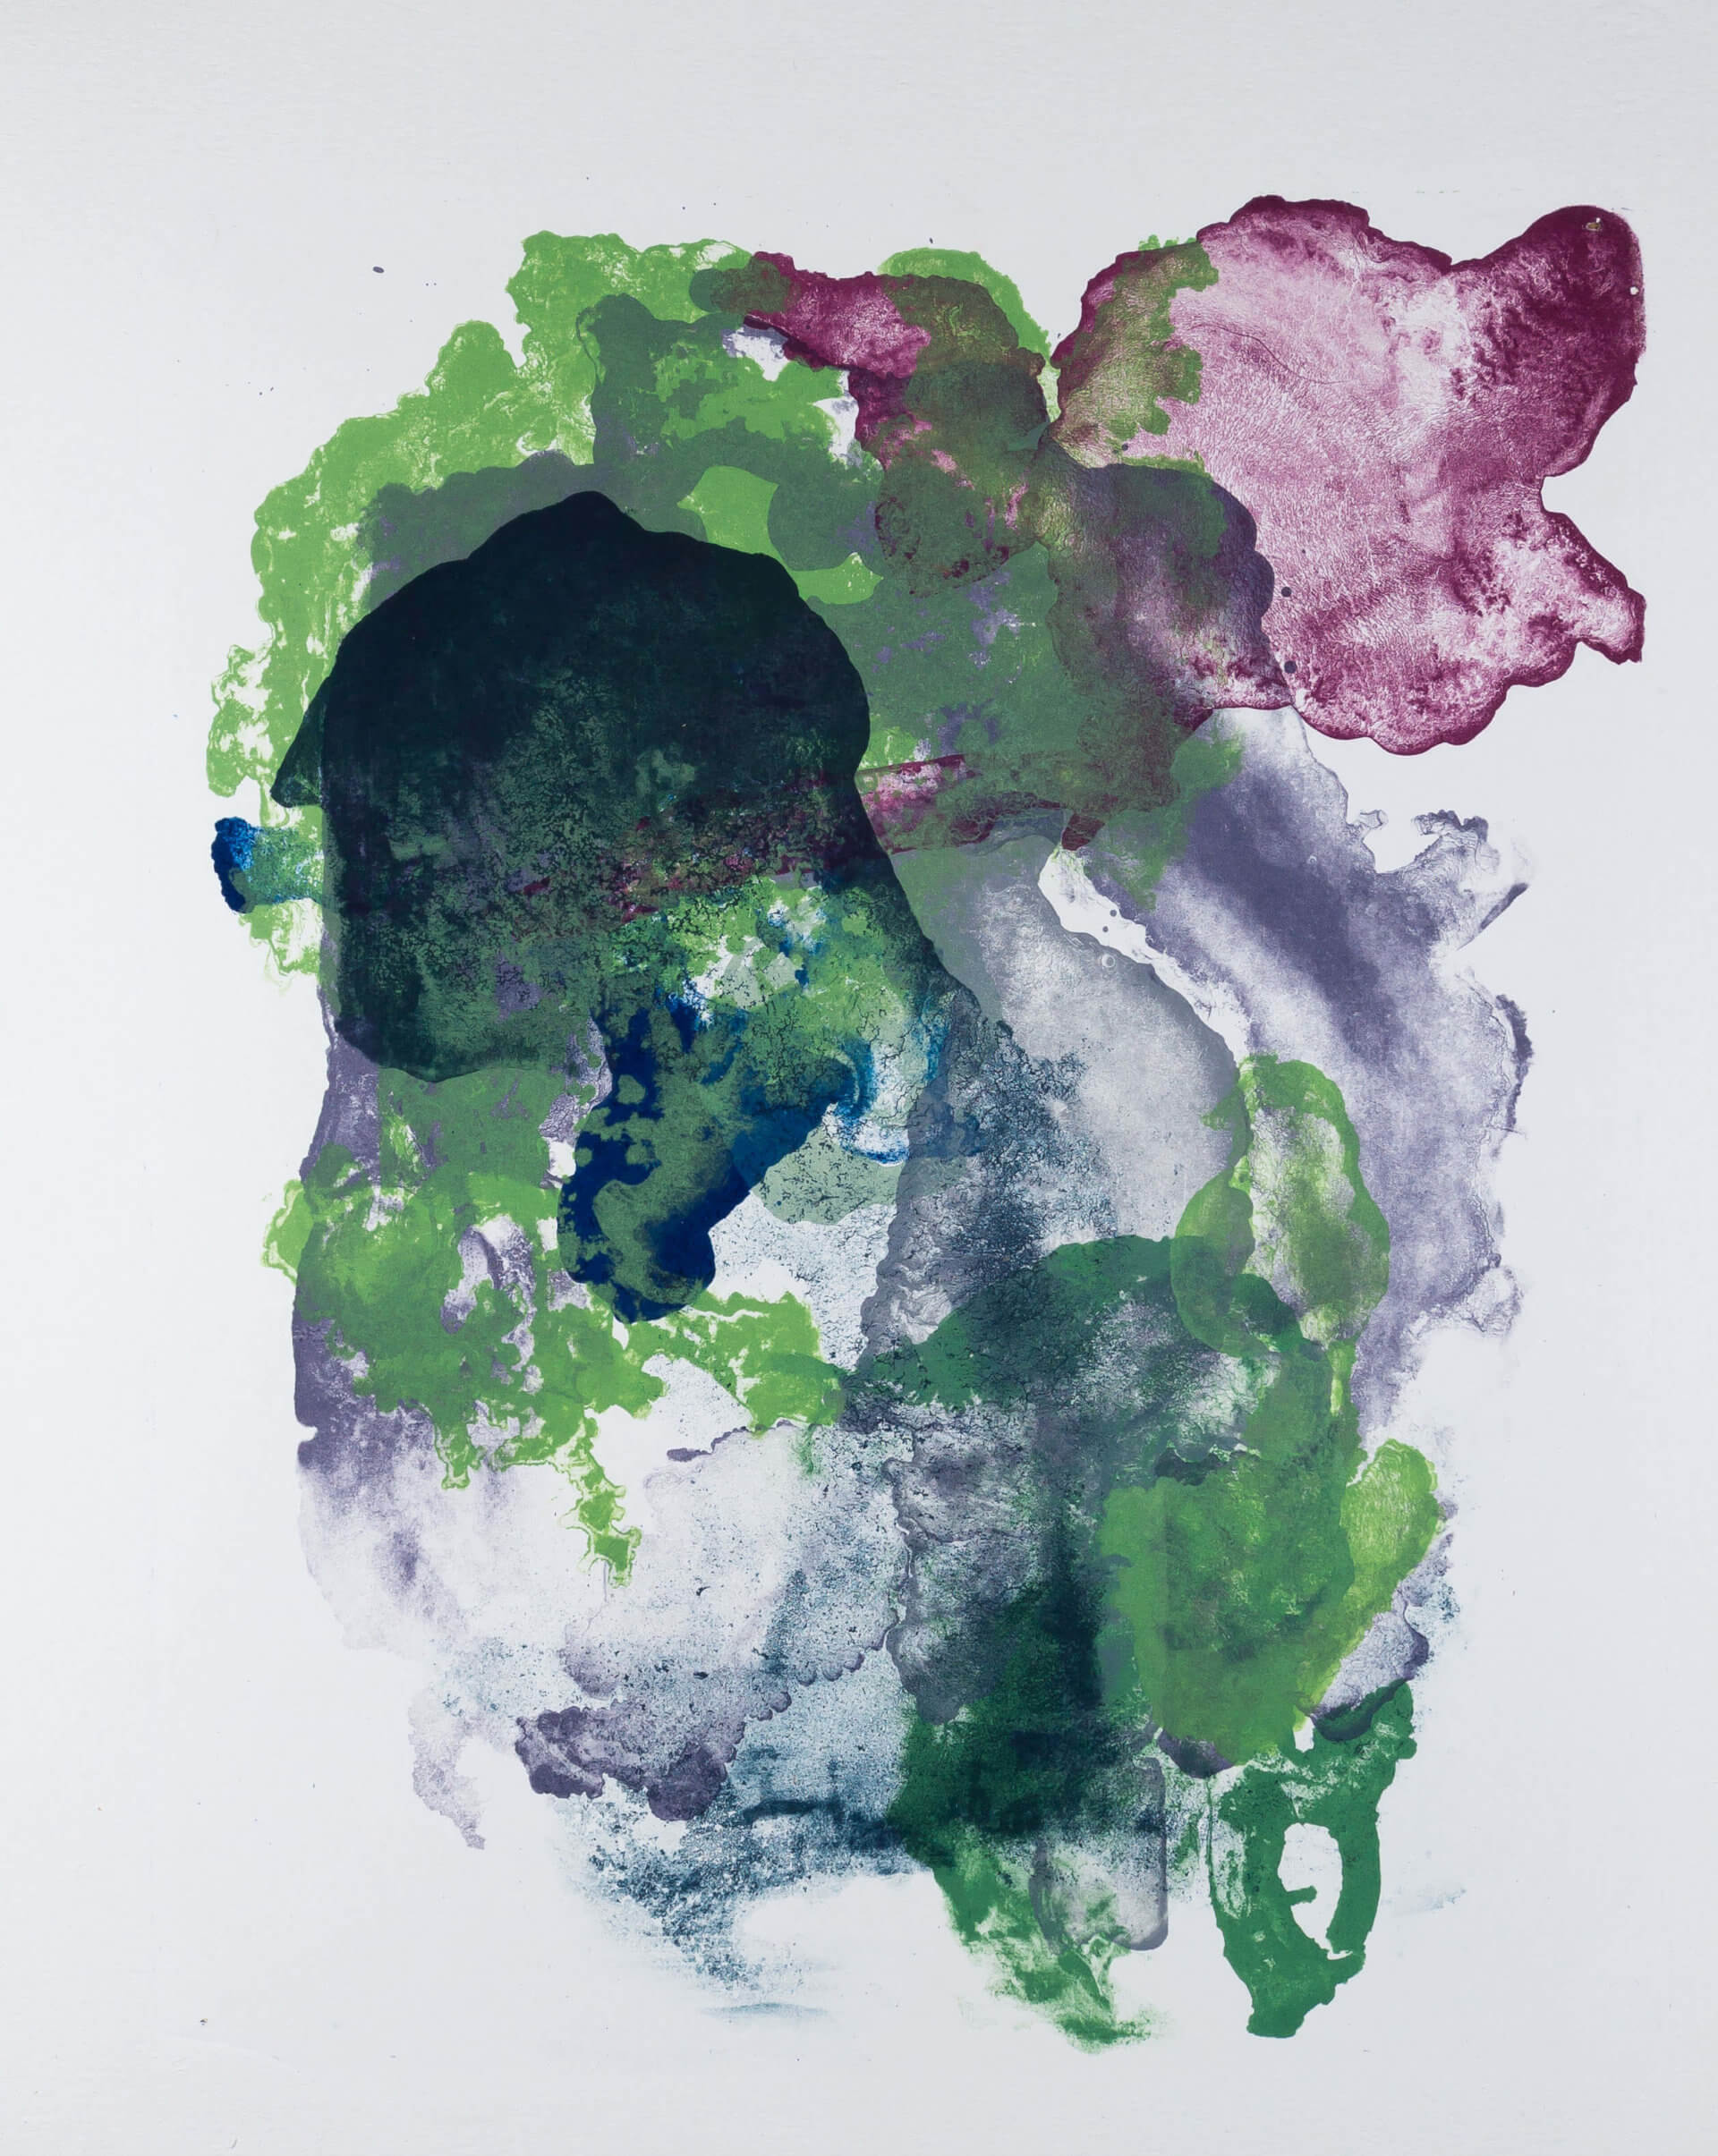 Katharina Albers, organism (growing)(H), 2017, Farblithographie, Unikat, 56x45 cm